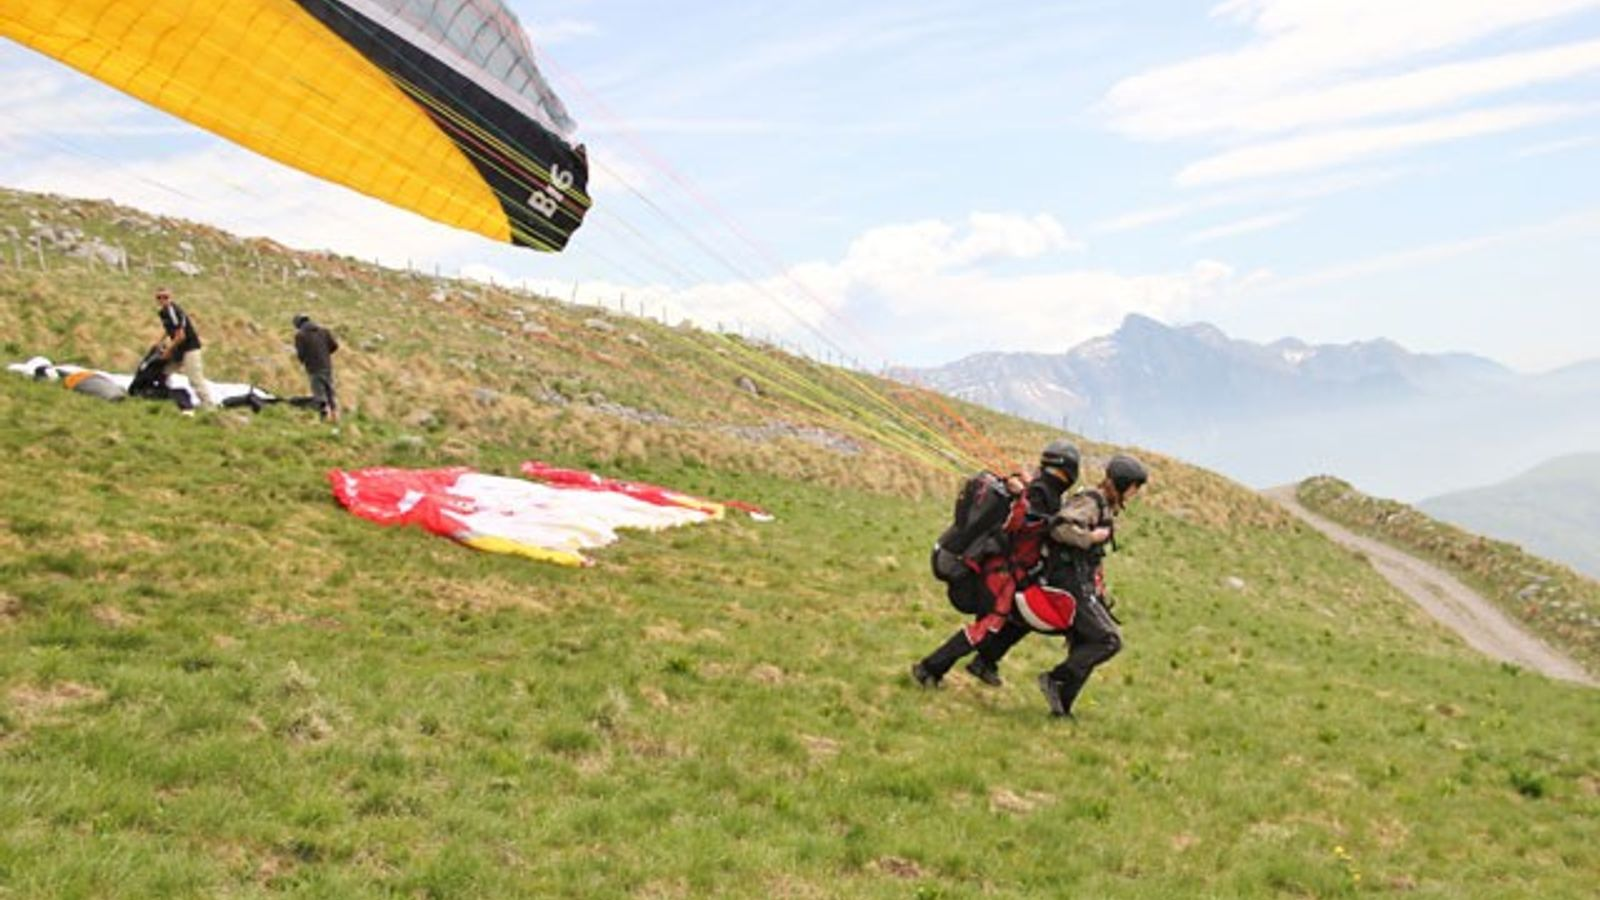 Paragliding in Slovenia